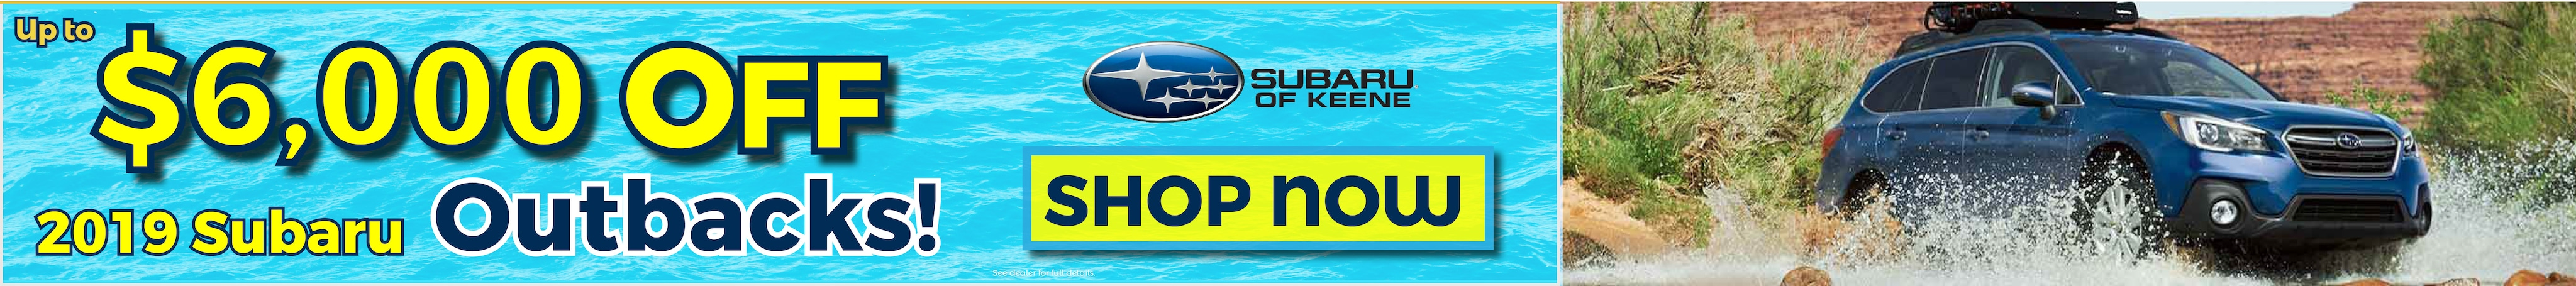 Subaru Of Keene >> Subaru Of Keene Serving Brattleboro Vt Peterborough Nh Rindge Nh